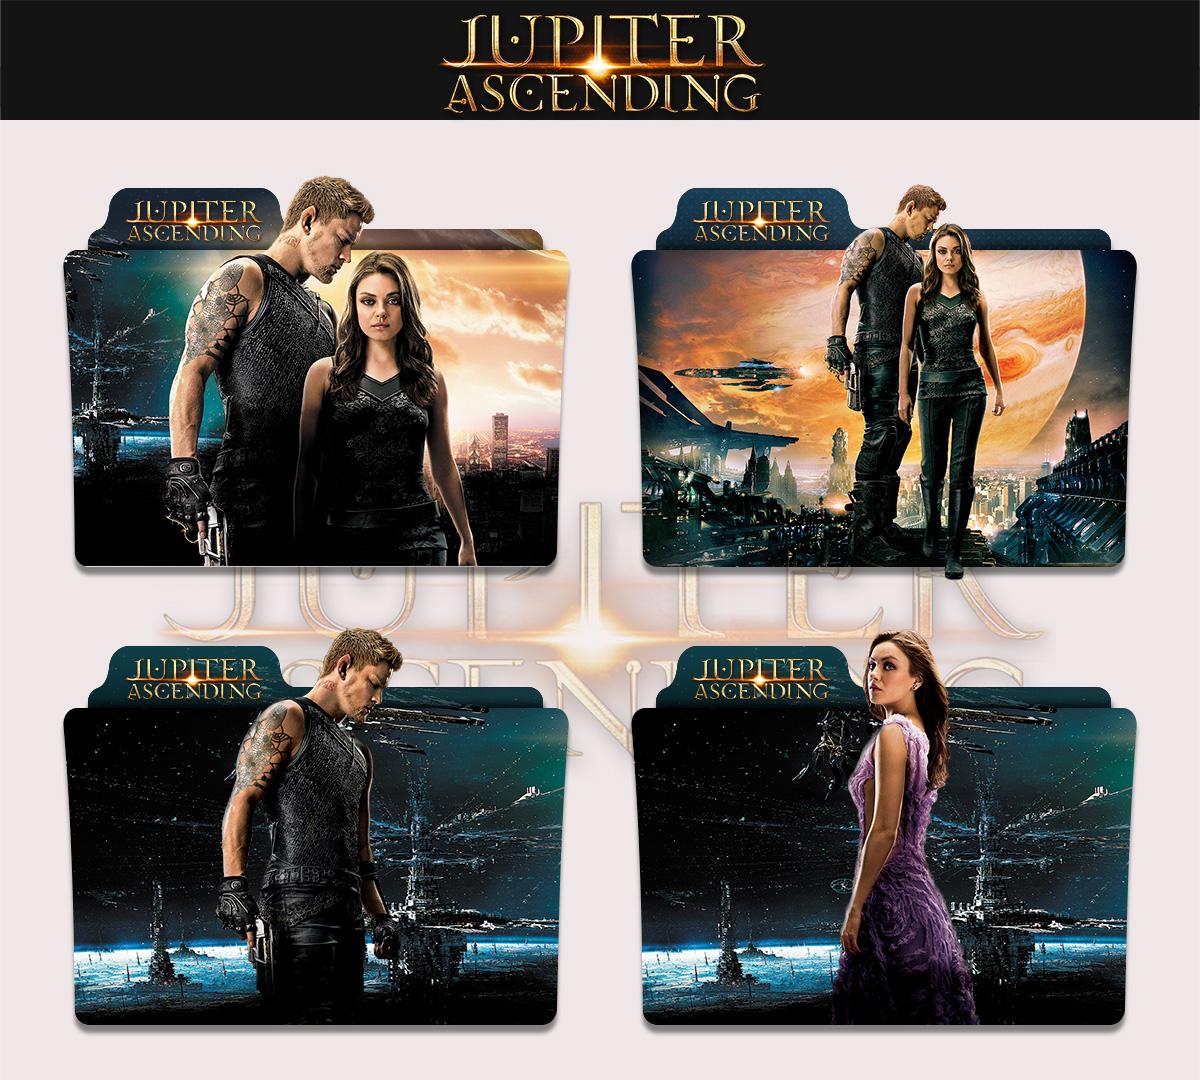 Jupiter Ascending 2015 Folder Icon By Sonerbyzt On Deviantart